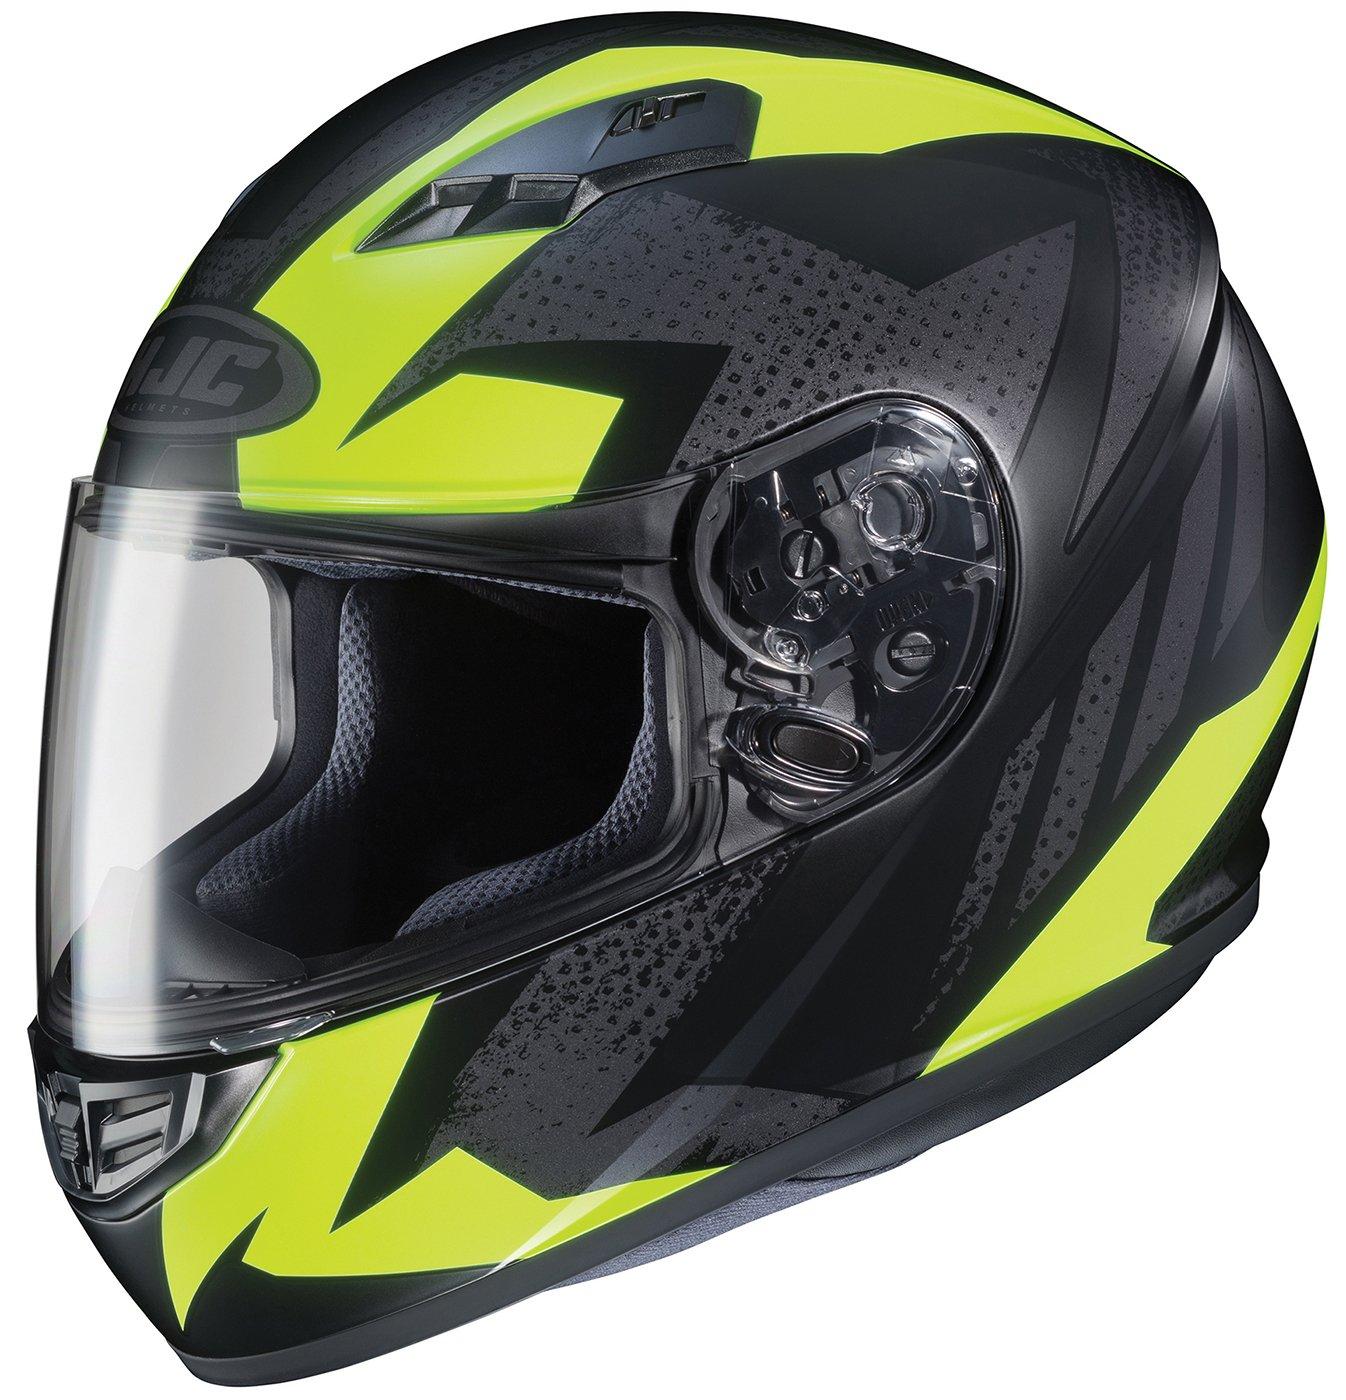 Black//Neon Green, Large HJC Helmets CS-R3 Unisex-Adult Full Face Treague Motorcycle Helmet